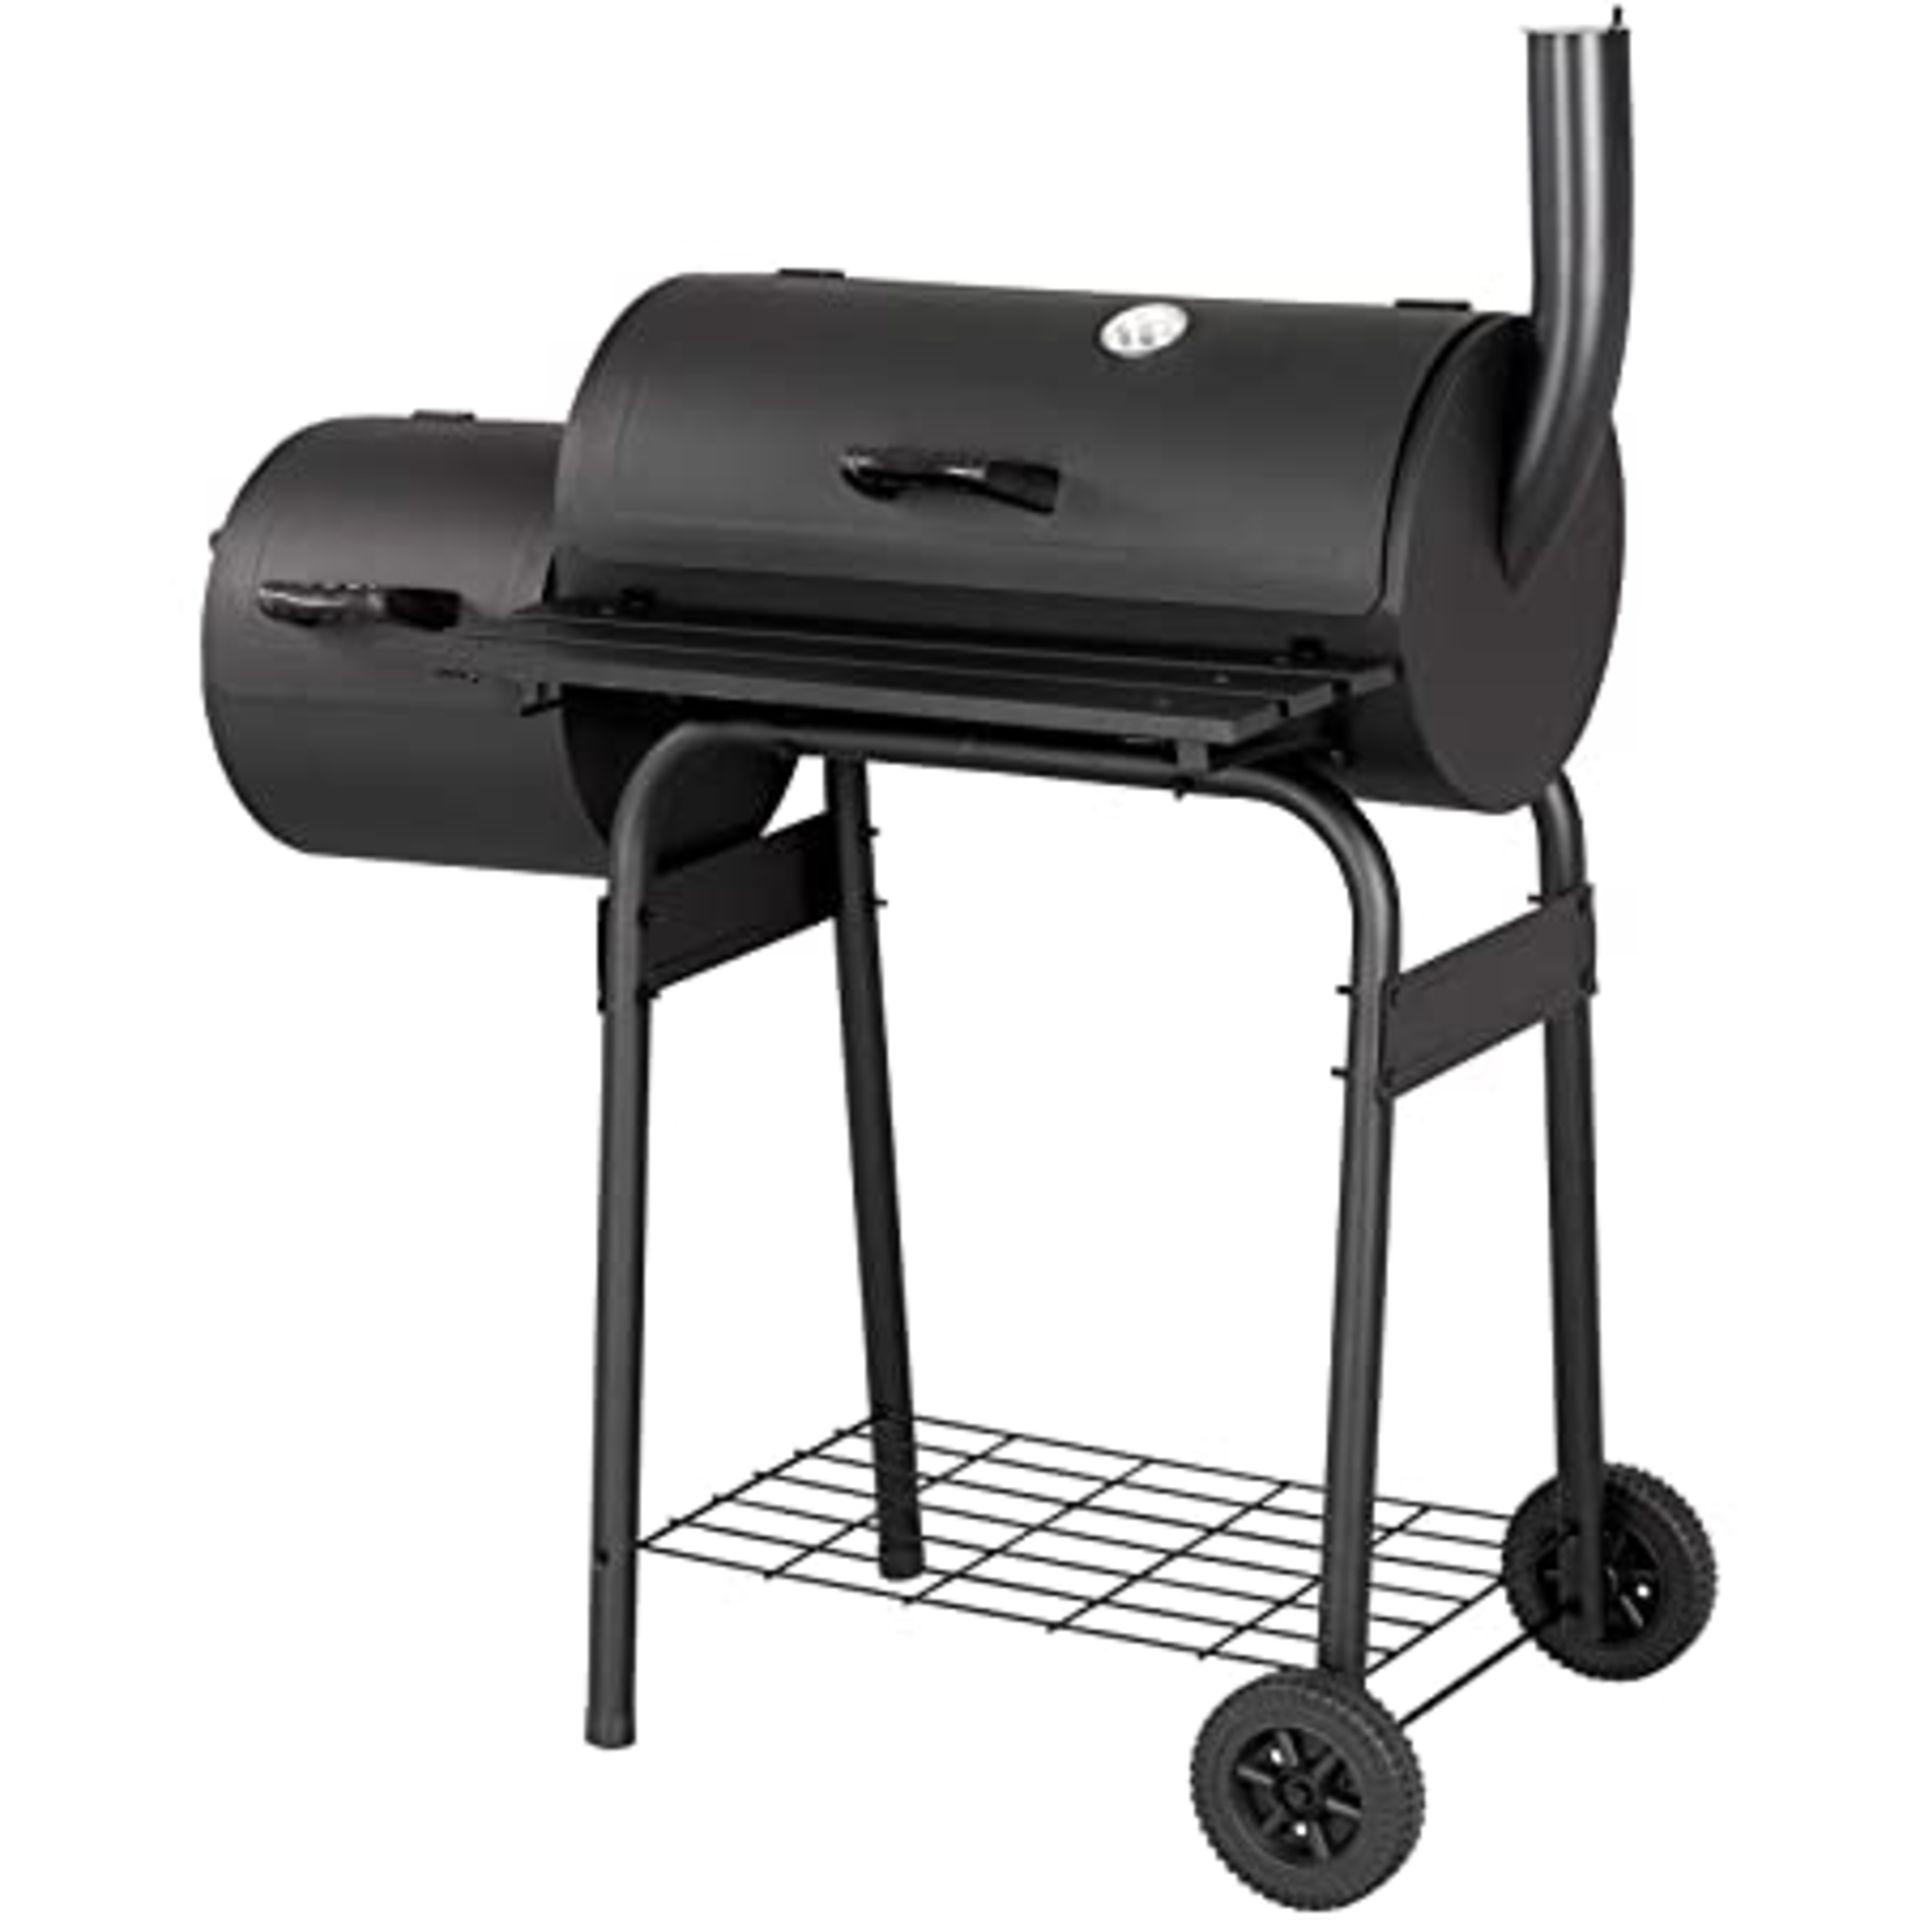 (P7) 1x Texas Starter Smoker & BBQ. Steel With Black Powder Coated Hood & Firebowl. (H114x W103x - Image 2 of 4